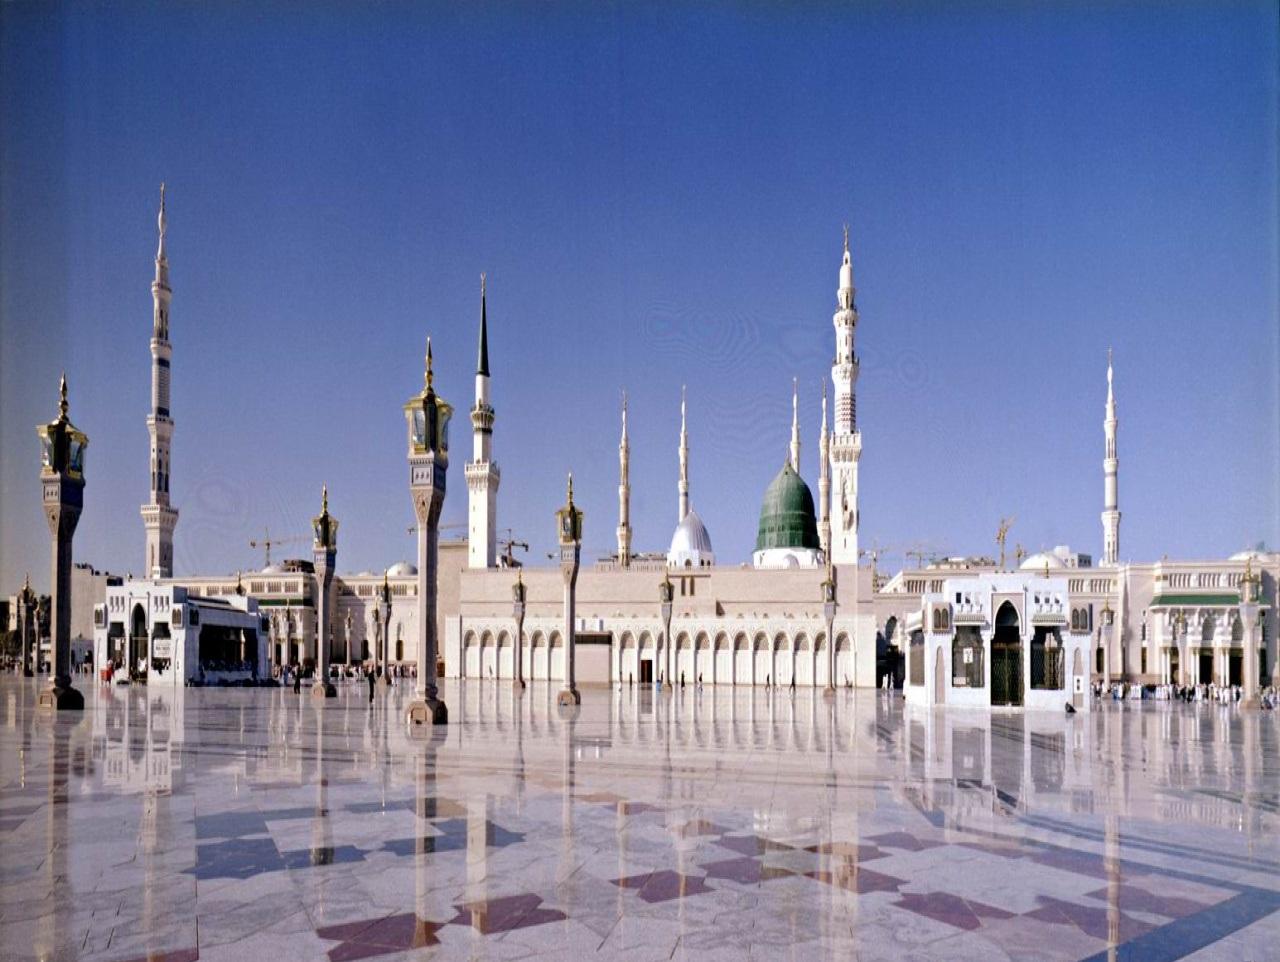 Wallpaper-HD-Blog: Roza-e-Rasool, Masjid Nabvi, Madina